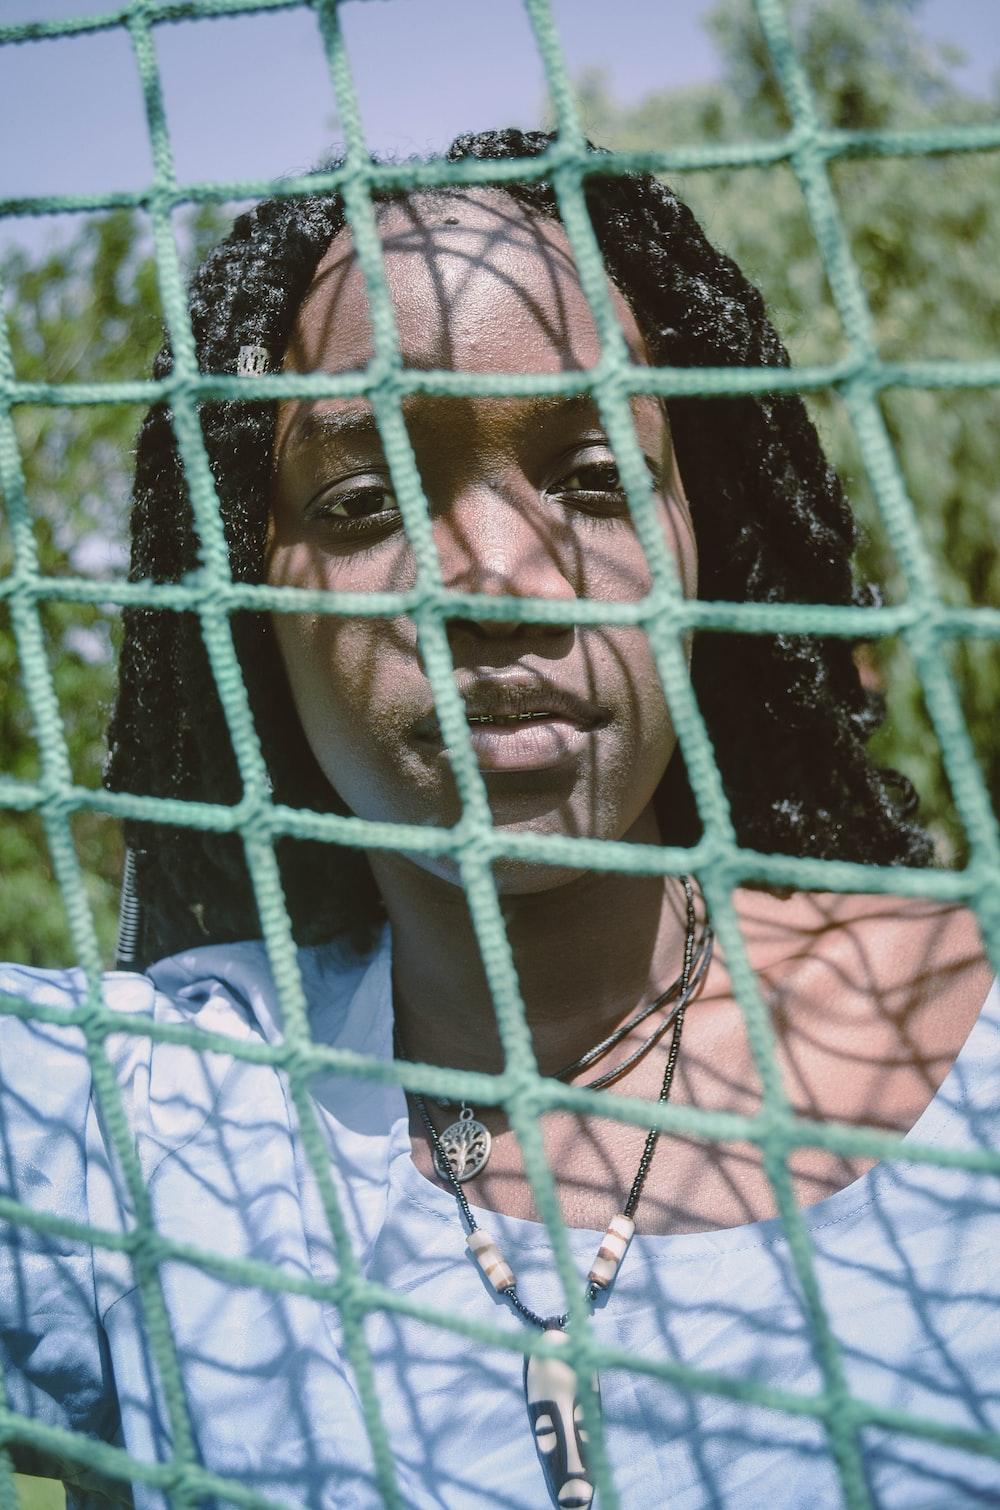 woman in blue scoop neck shirt through net